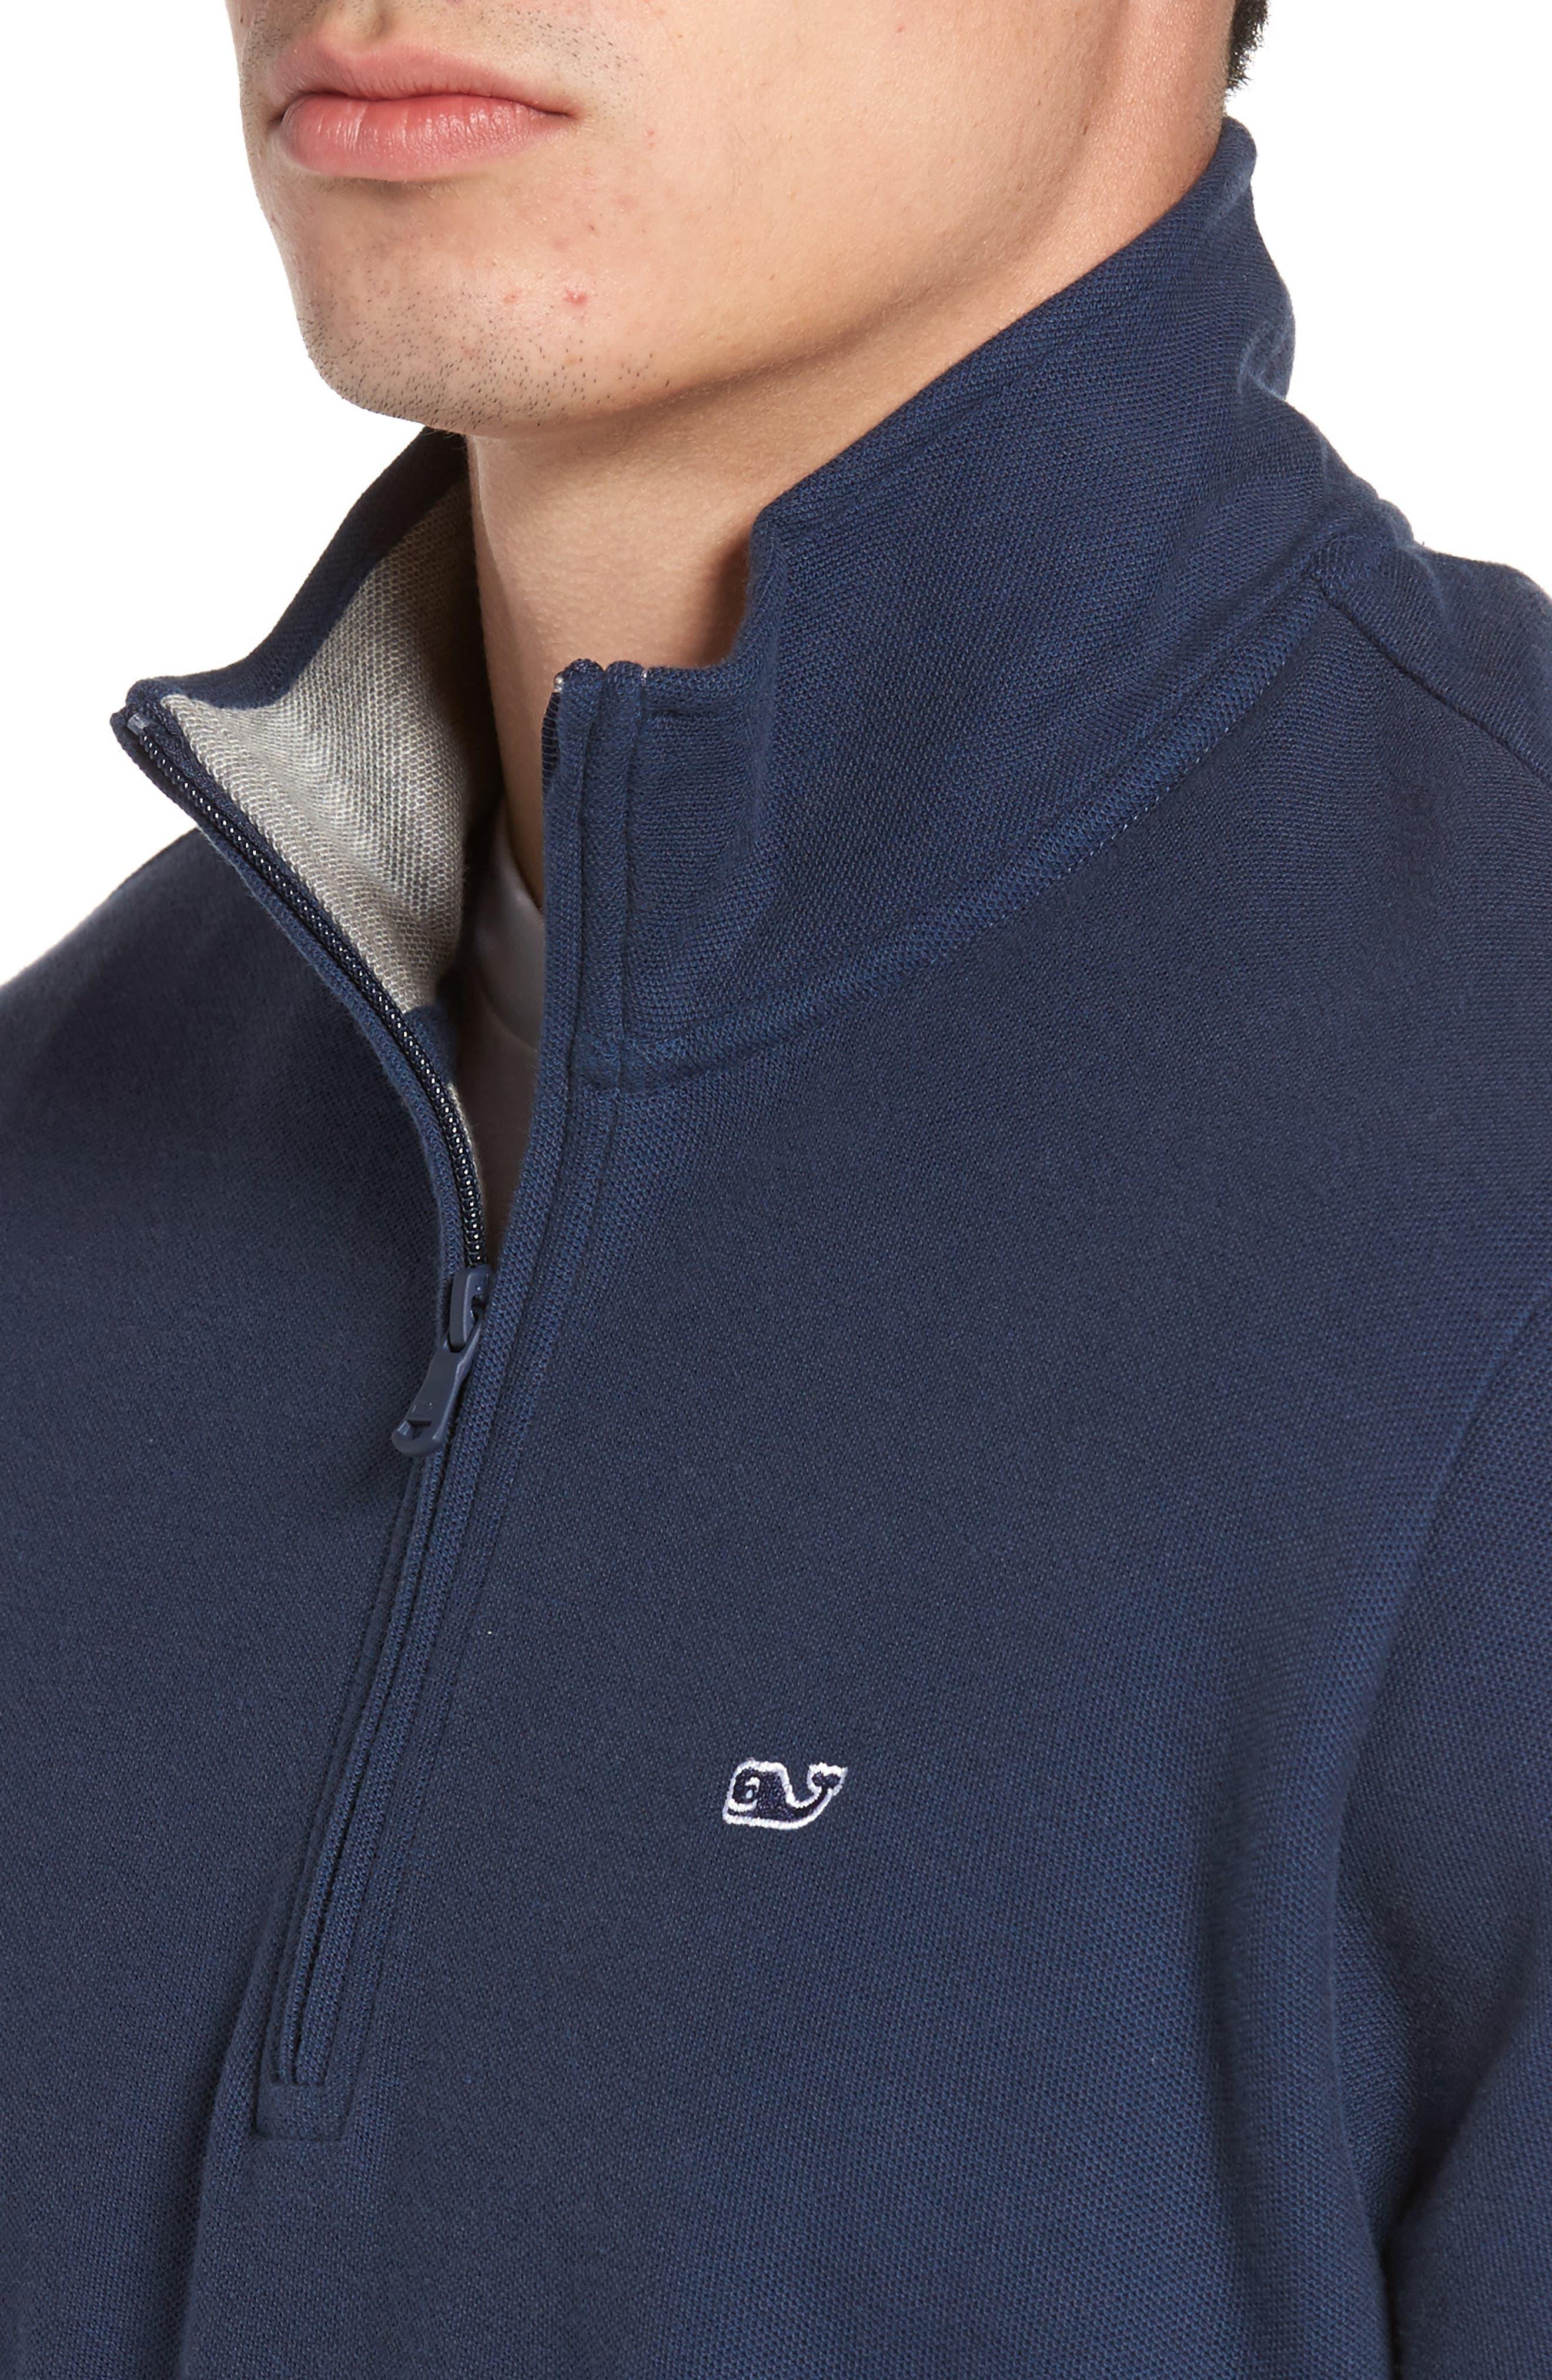 Reverse Oxford Quarter Zip Pullover,                             Alternate thumbnail 4, color,                             Vineyard Navy